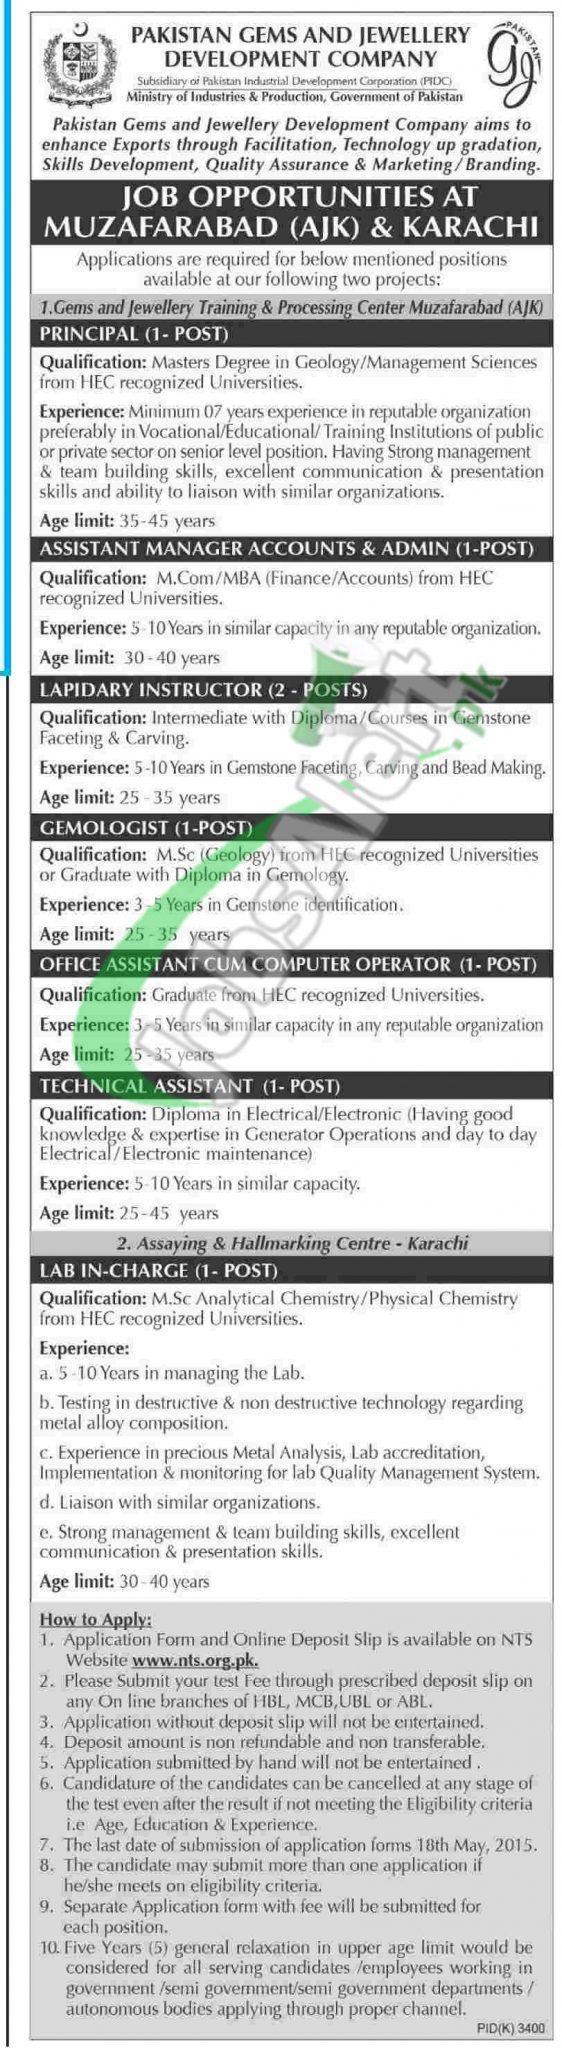 Pakistan Gems & Jewellery Development Company Jobs